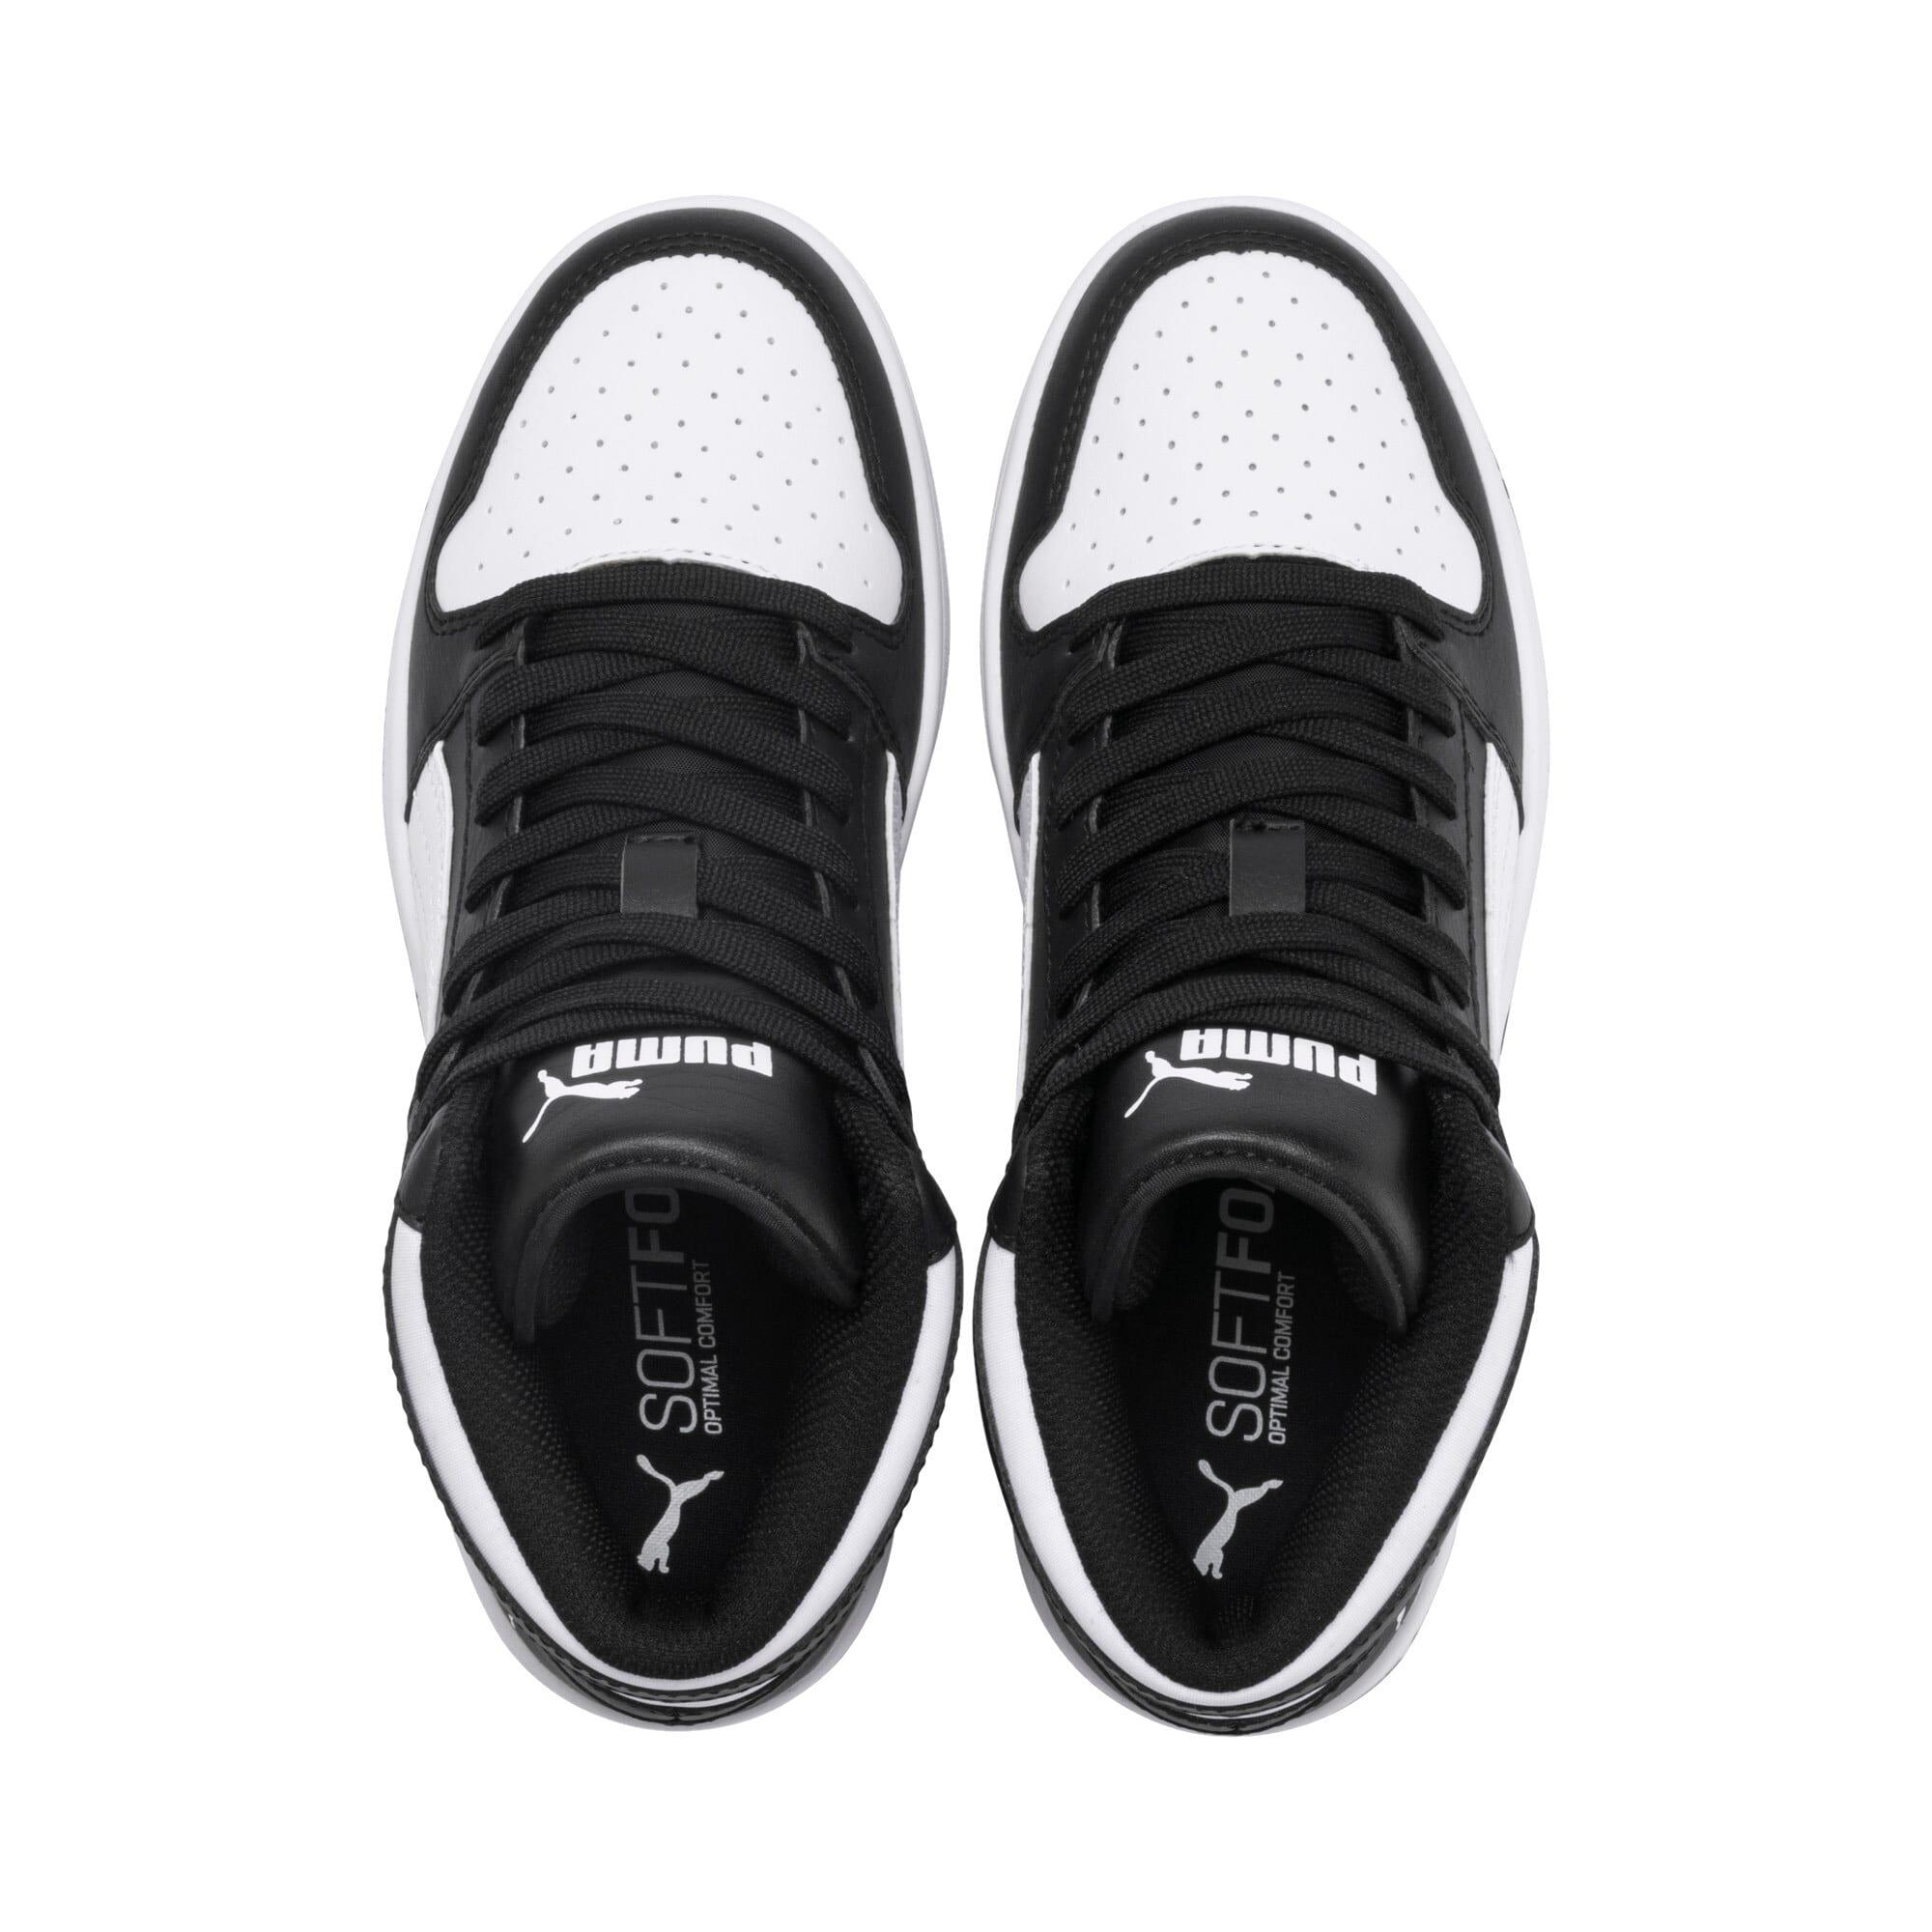 Thumbnail 6 of PUMA Rebound LayUp Mid Sneakers JR, Puma Black-Puma White, medium